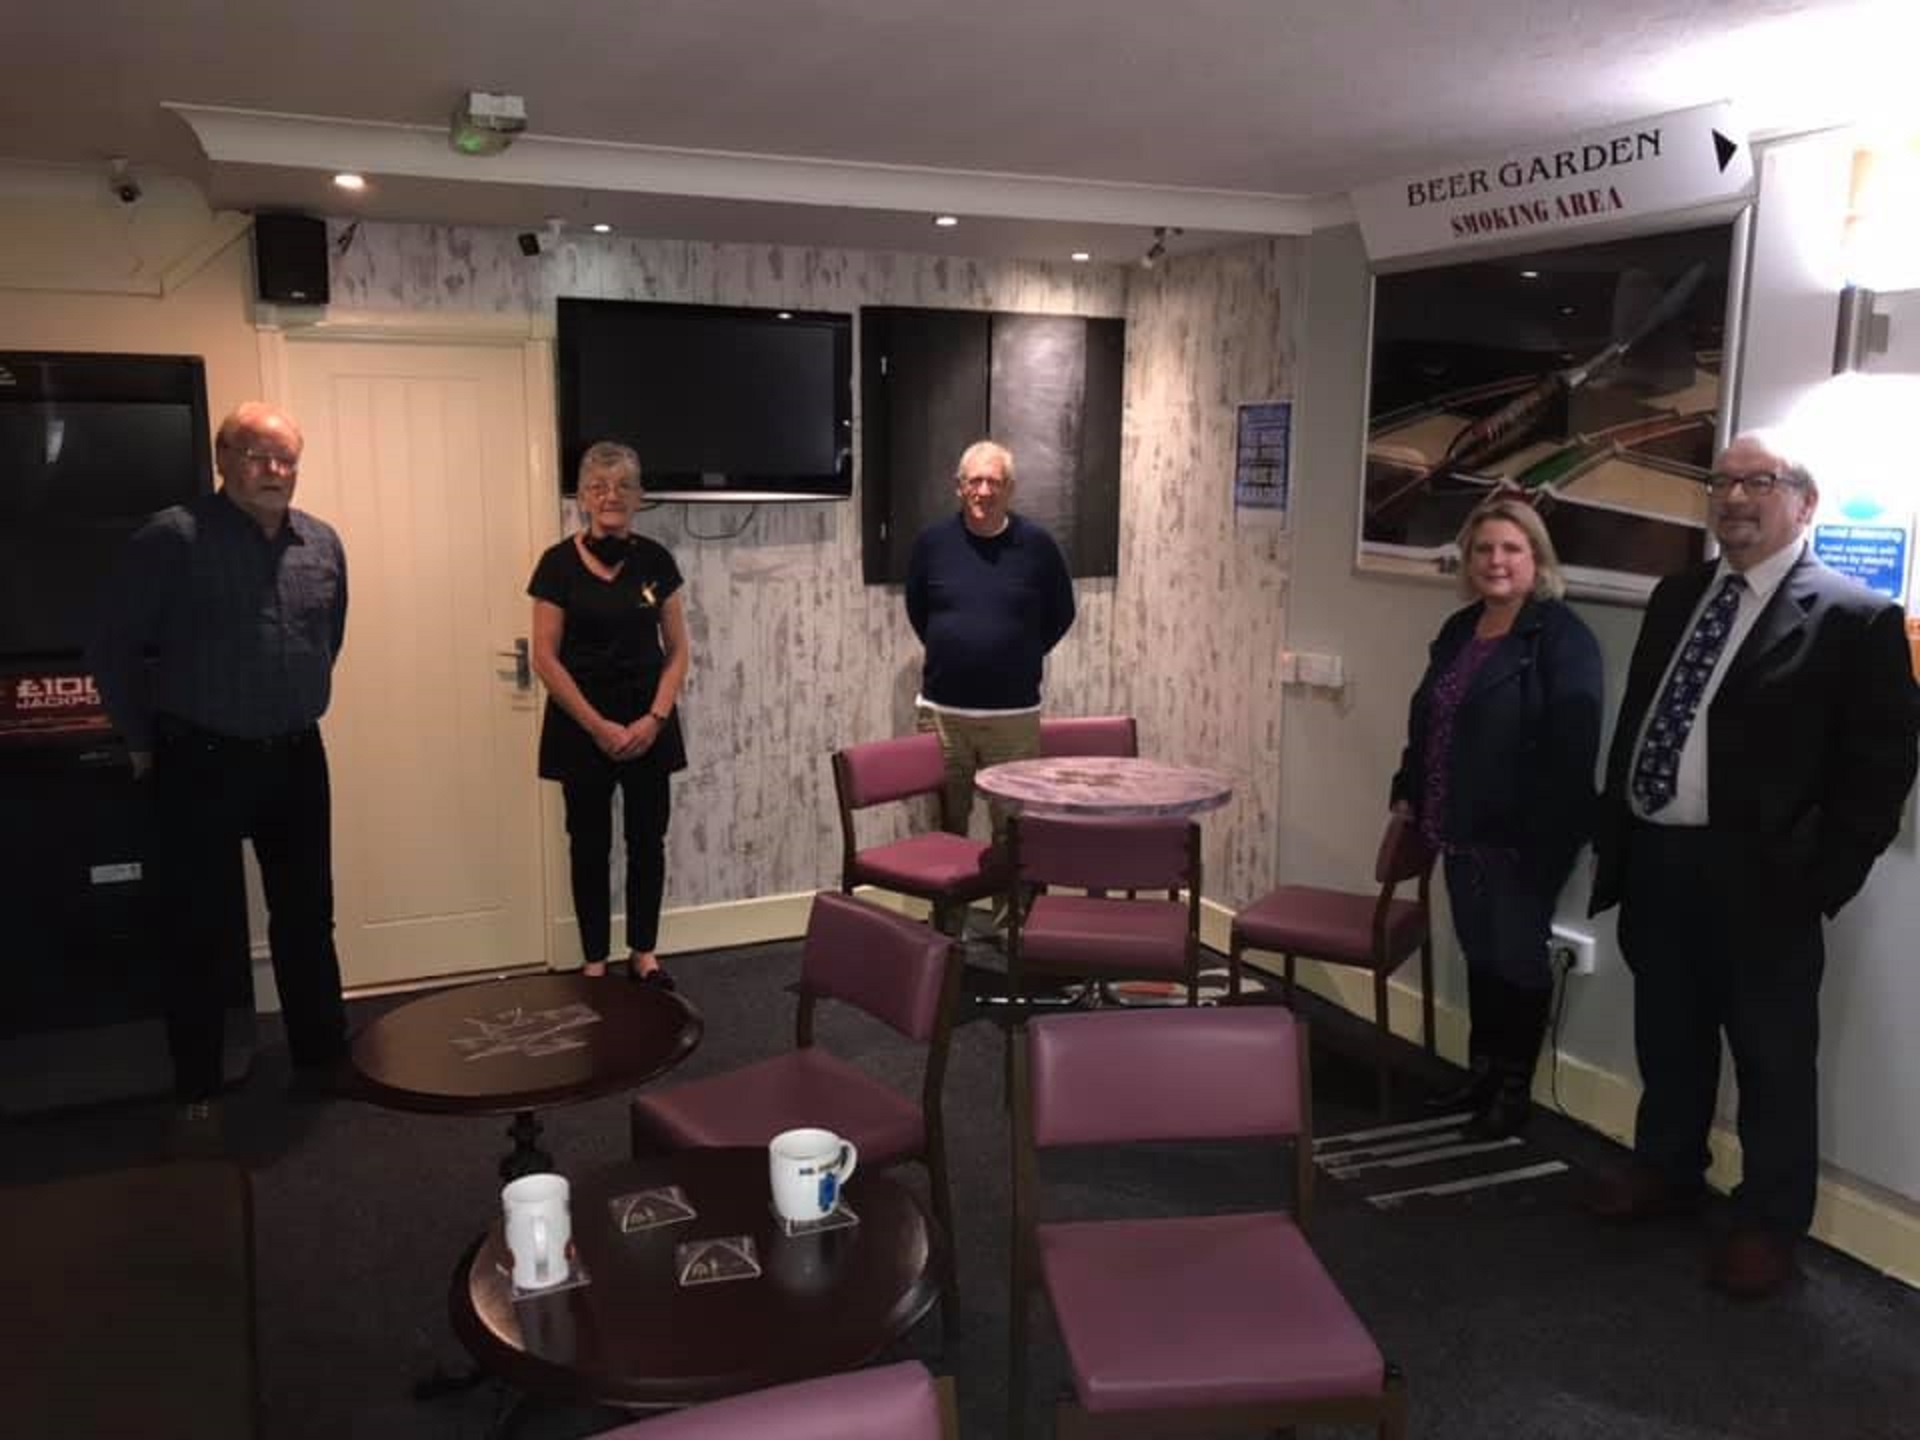 Jeff Ellis (FLTA board), Irene Gibson (Monarch Bar owner), Douglas Chapman MP, Mhorag Douglas (Chair of FLTA) and Brain Gordon (FLTA board).